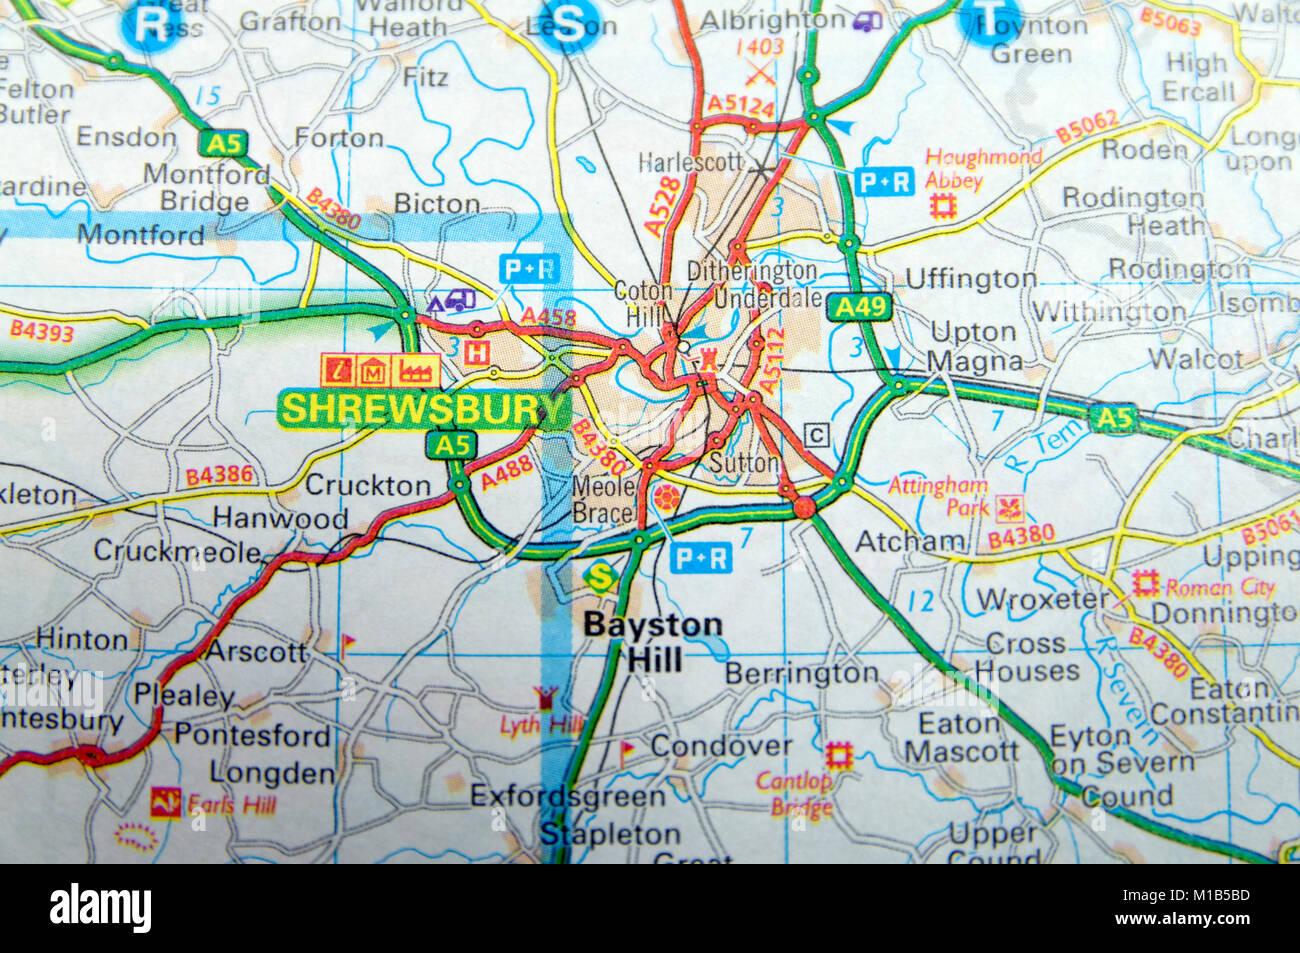 Road Map of Shrewsbury, England Stock Photo: 172964049 - Alamy